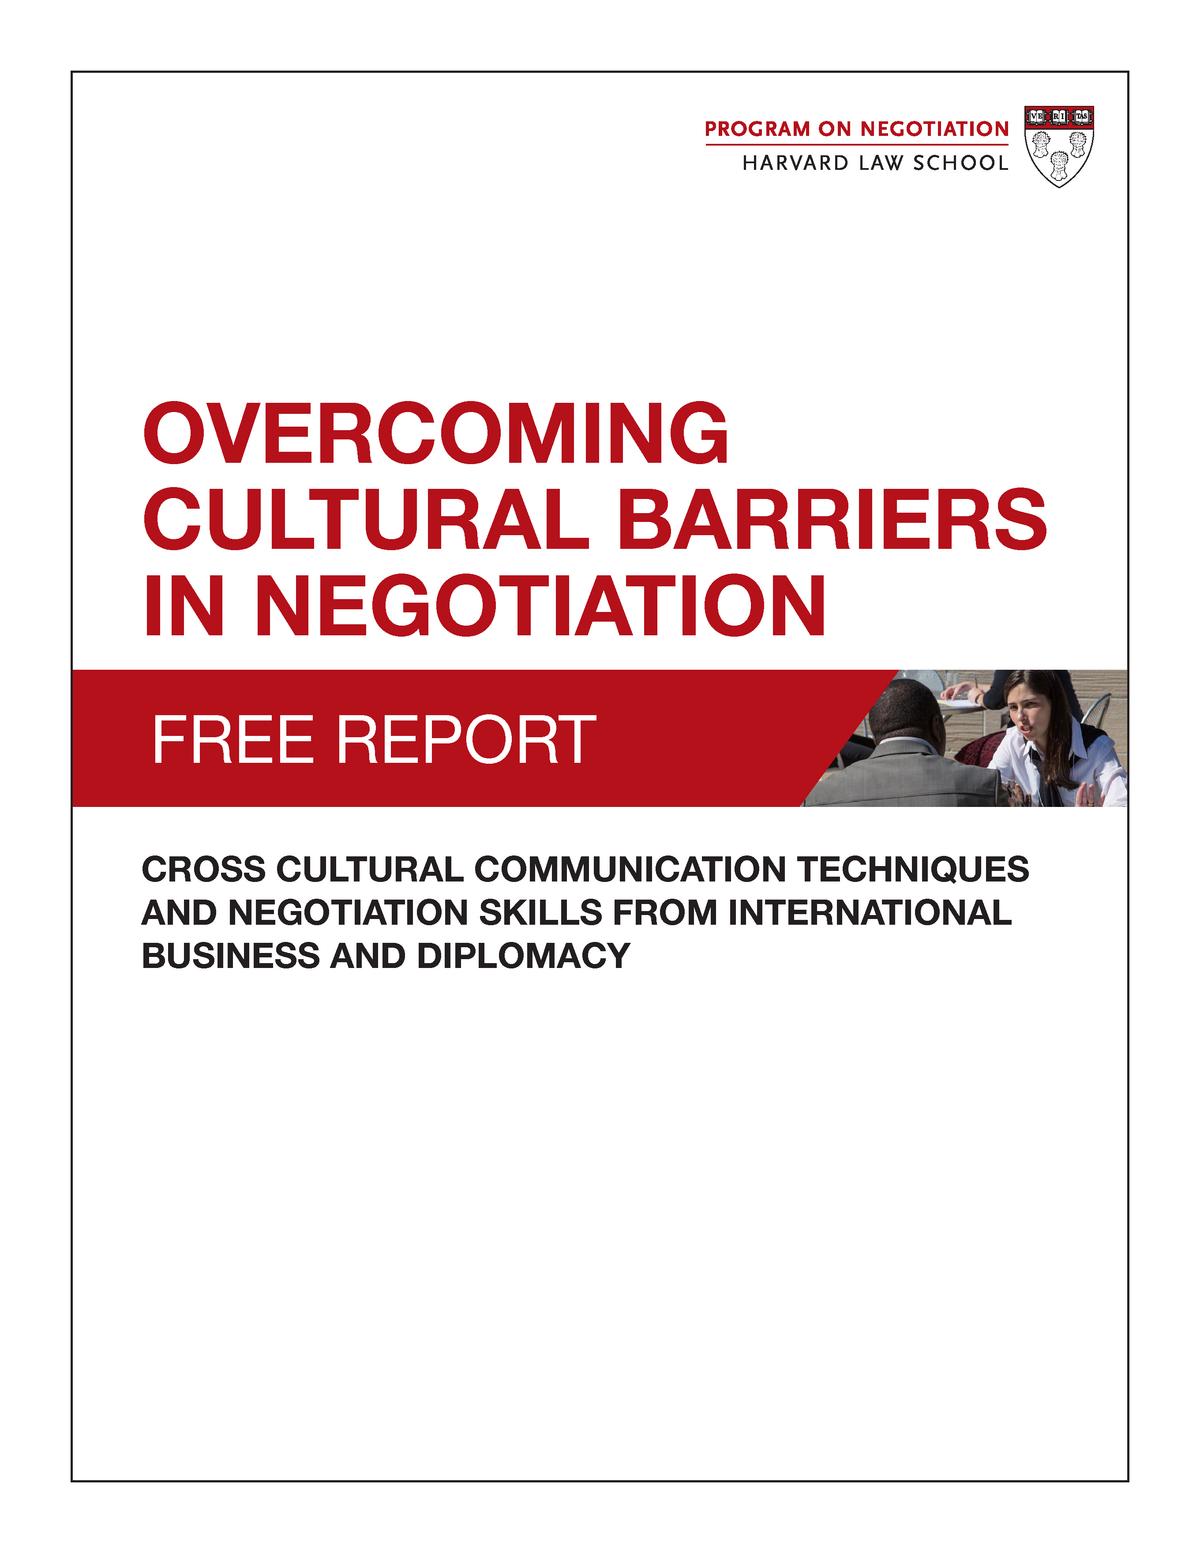 Cross Cultural Communications techniques and negotiation skills